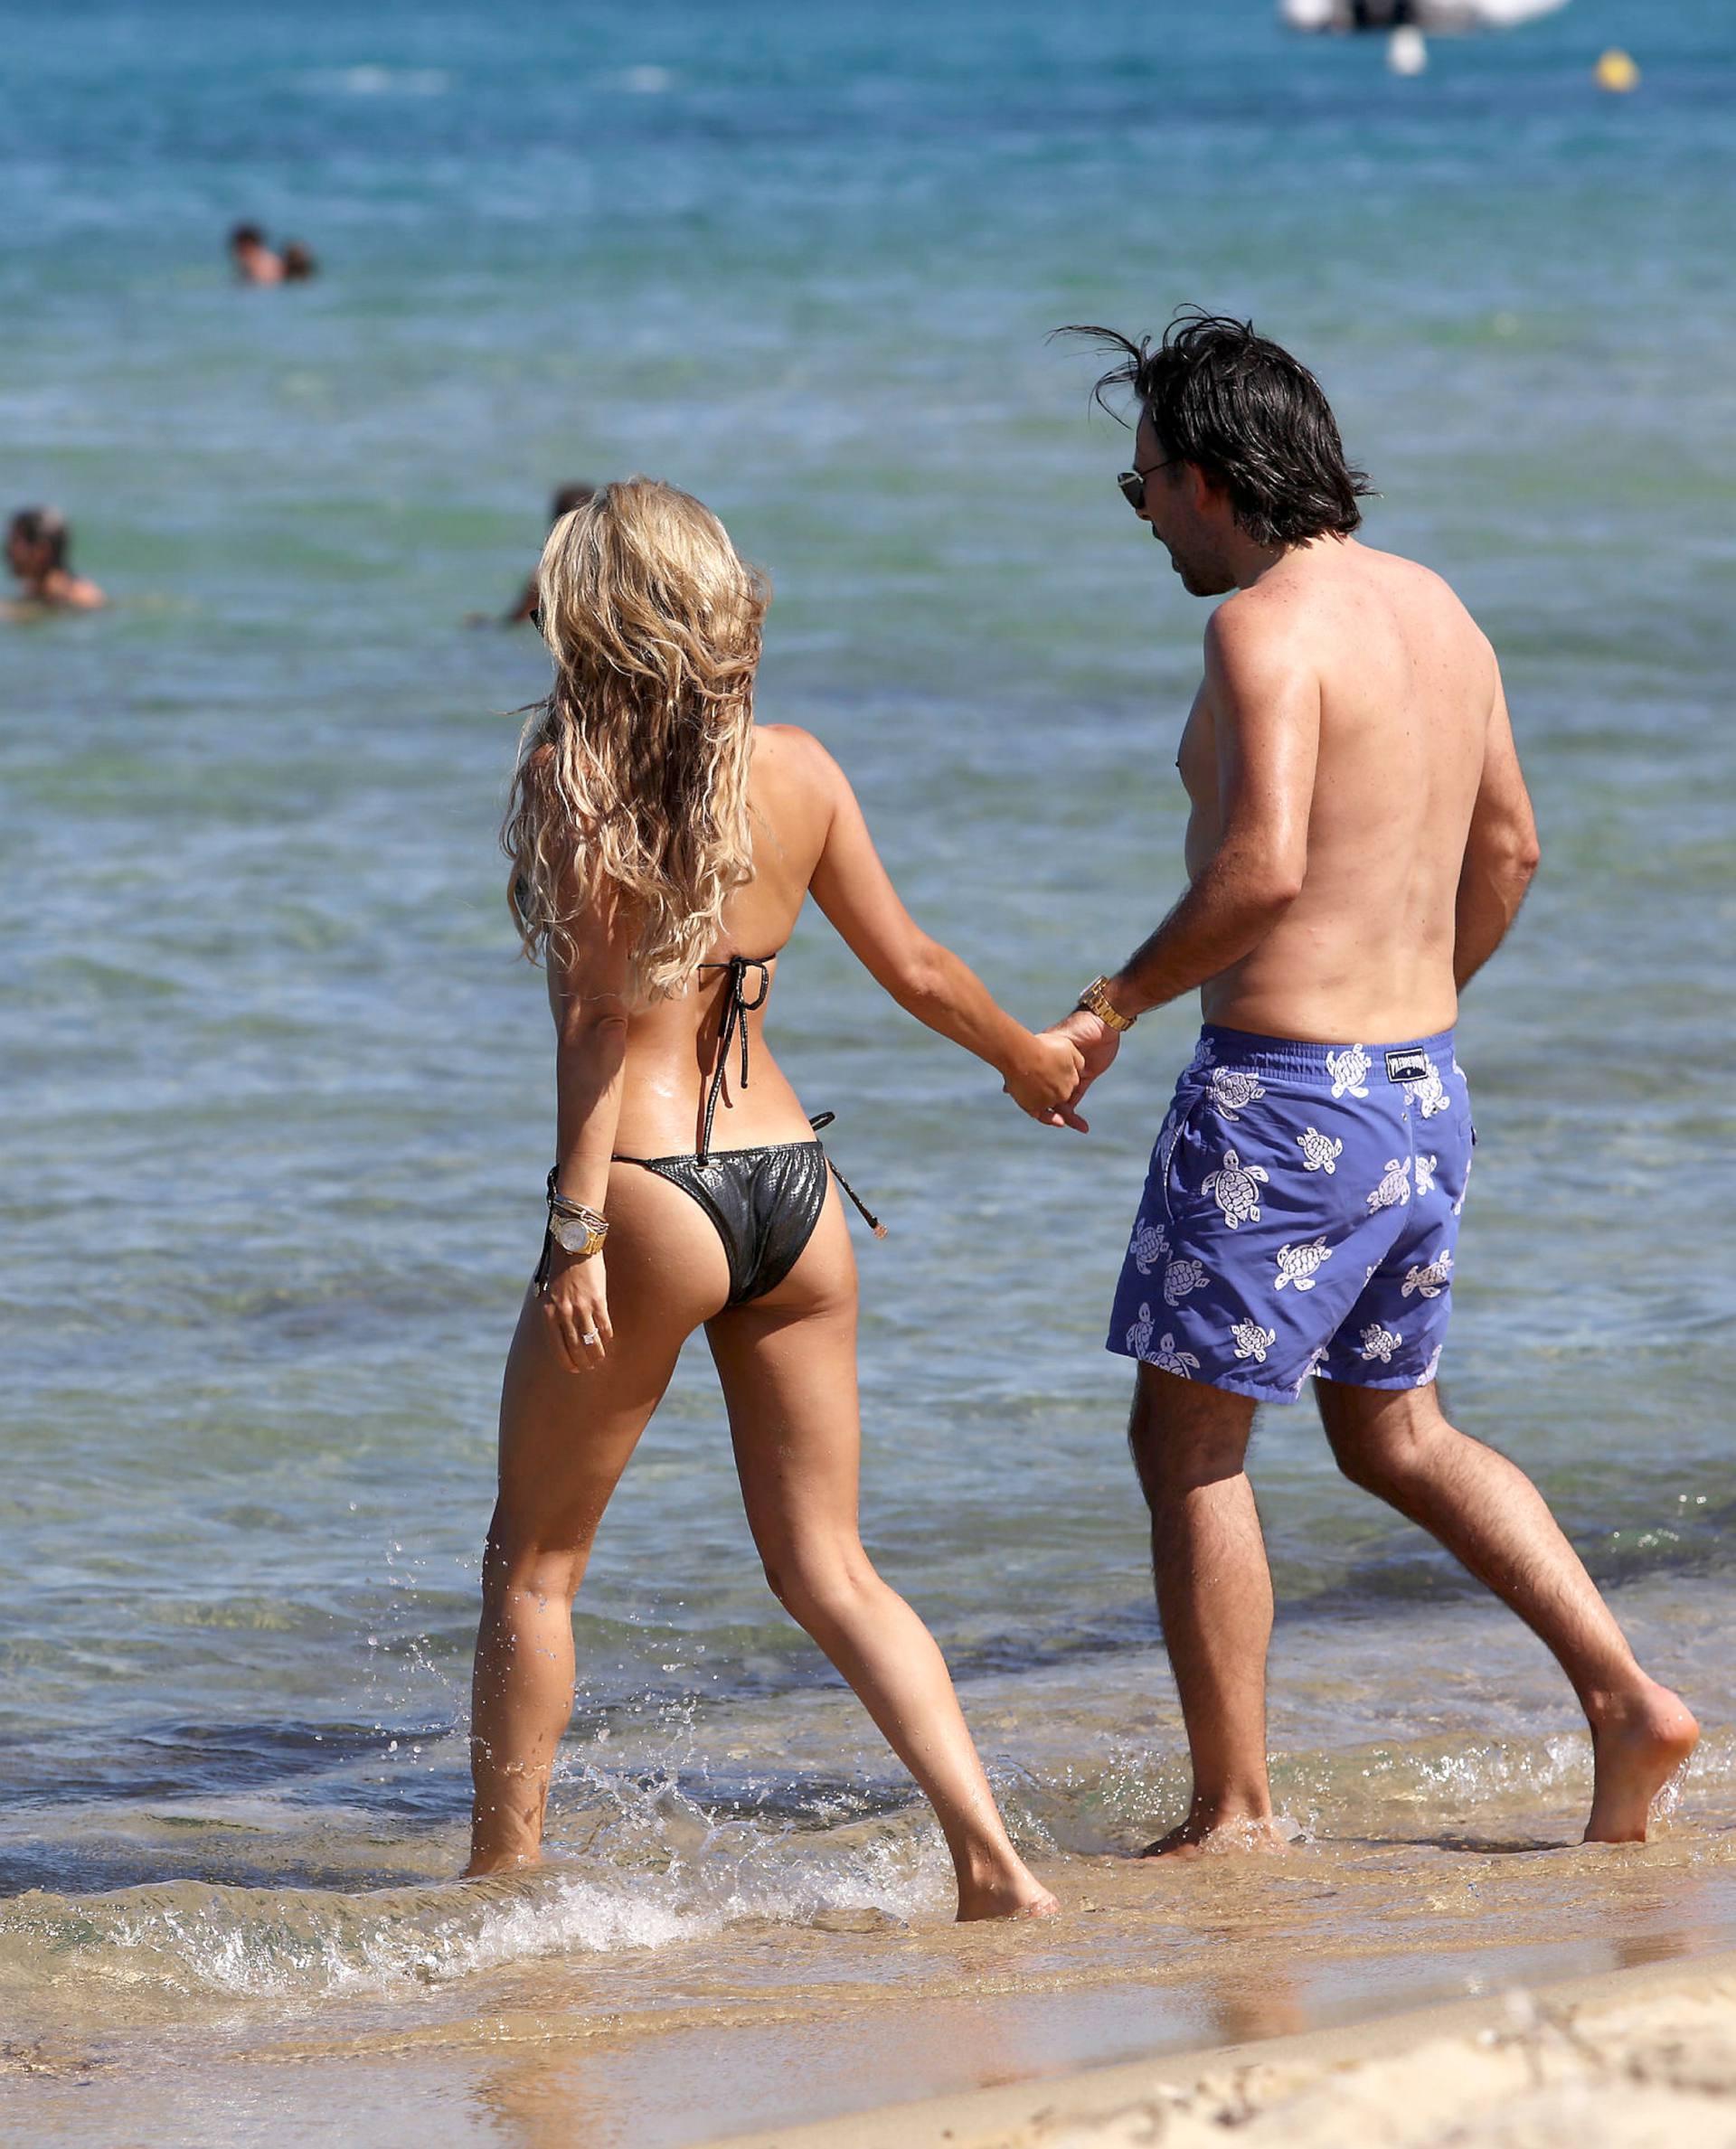 Sylvie Meis – Sexy Boobs In Bikini On The Beach In Saint Tropez 0023